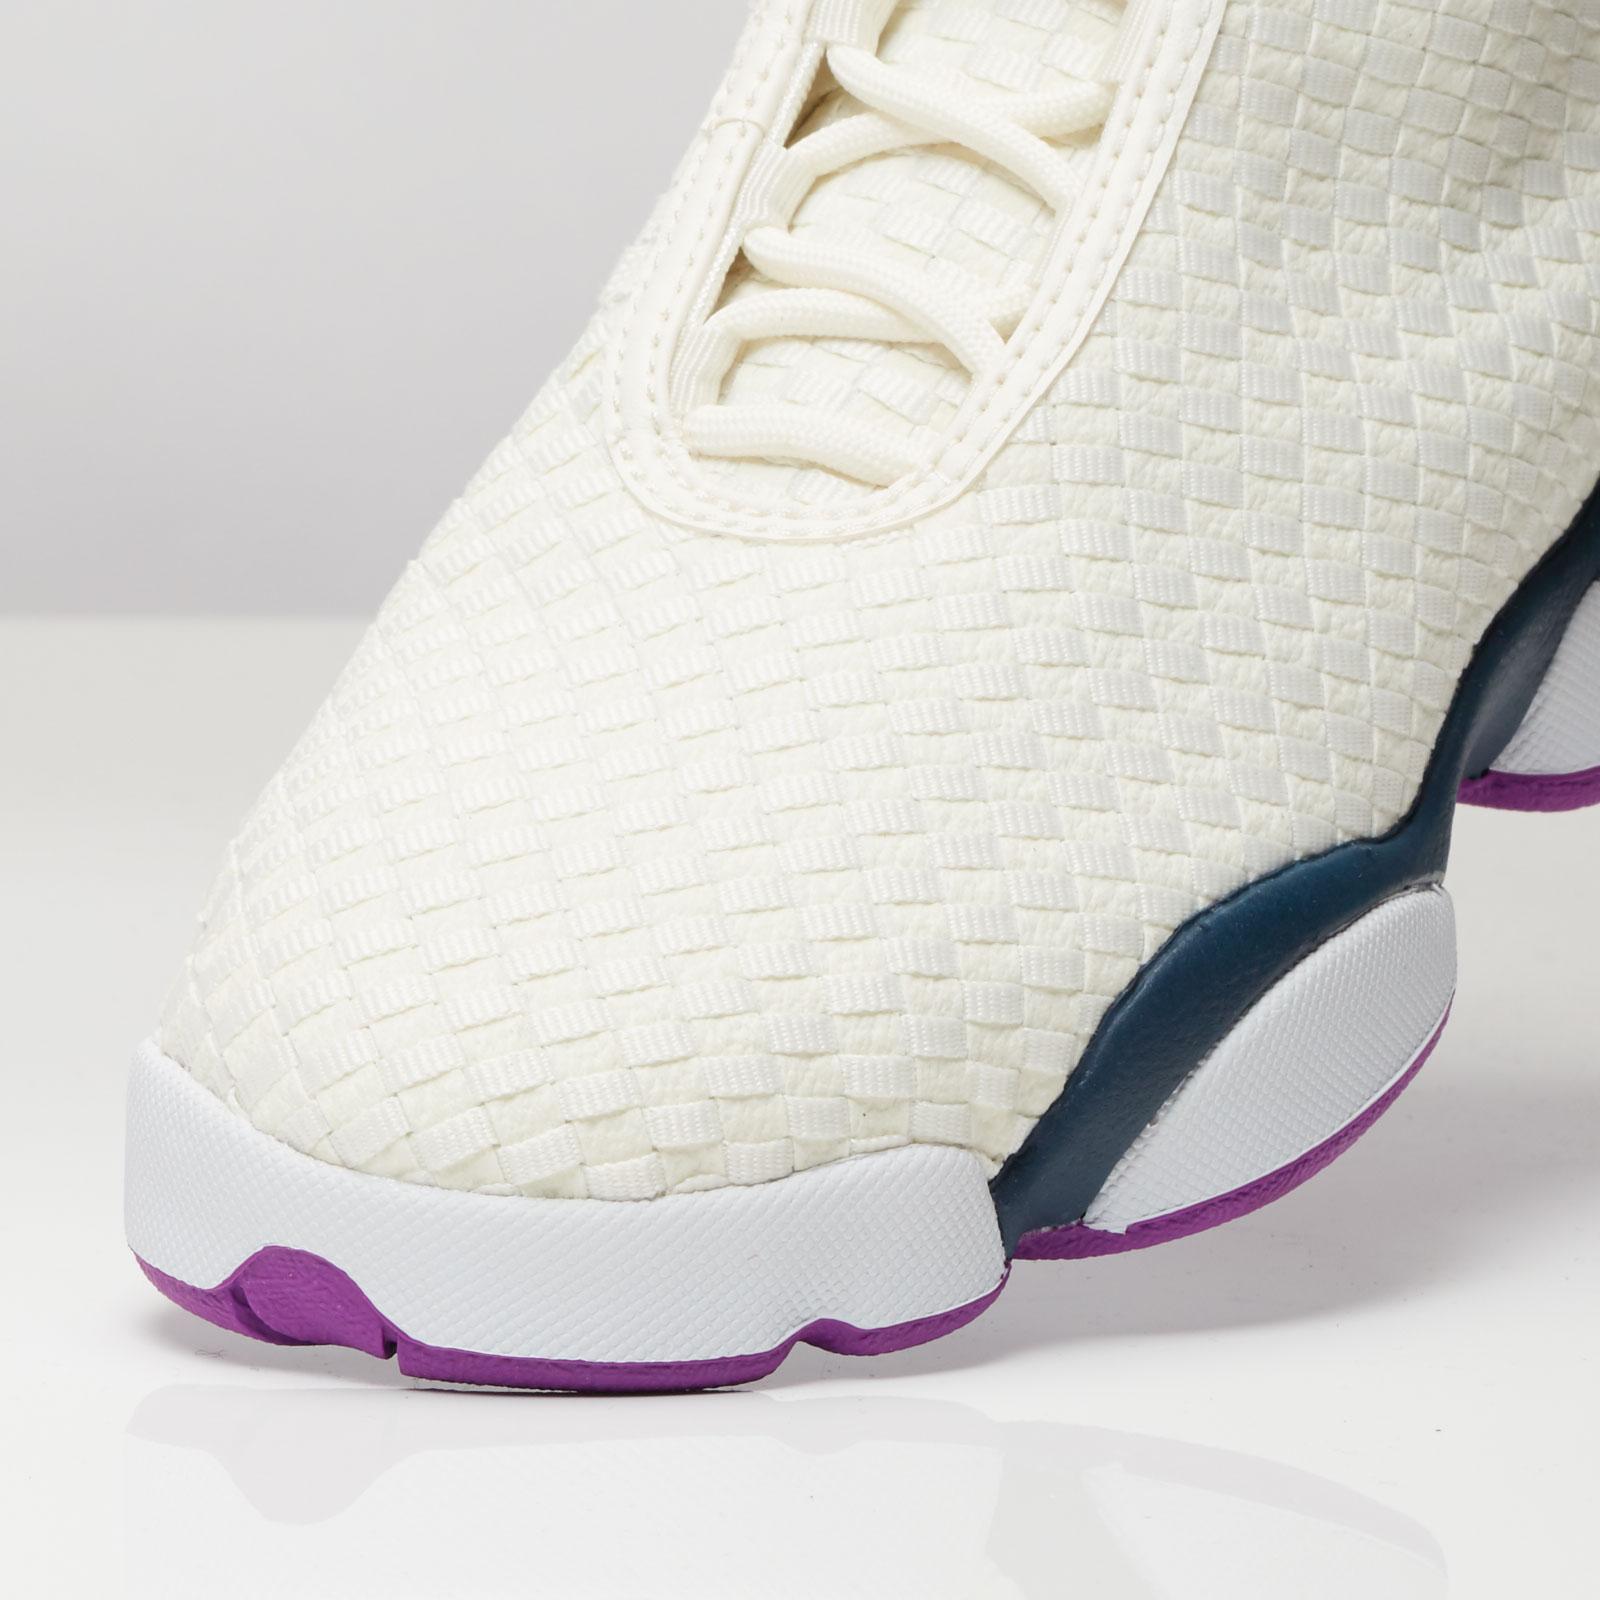 cd1dac27d6d777 Jordan Brand Jordan Horizon (GS) - 819848-127 - Sneakersnstuff ...